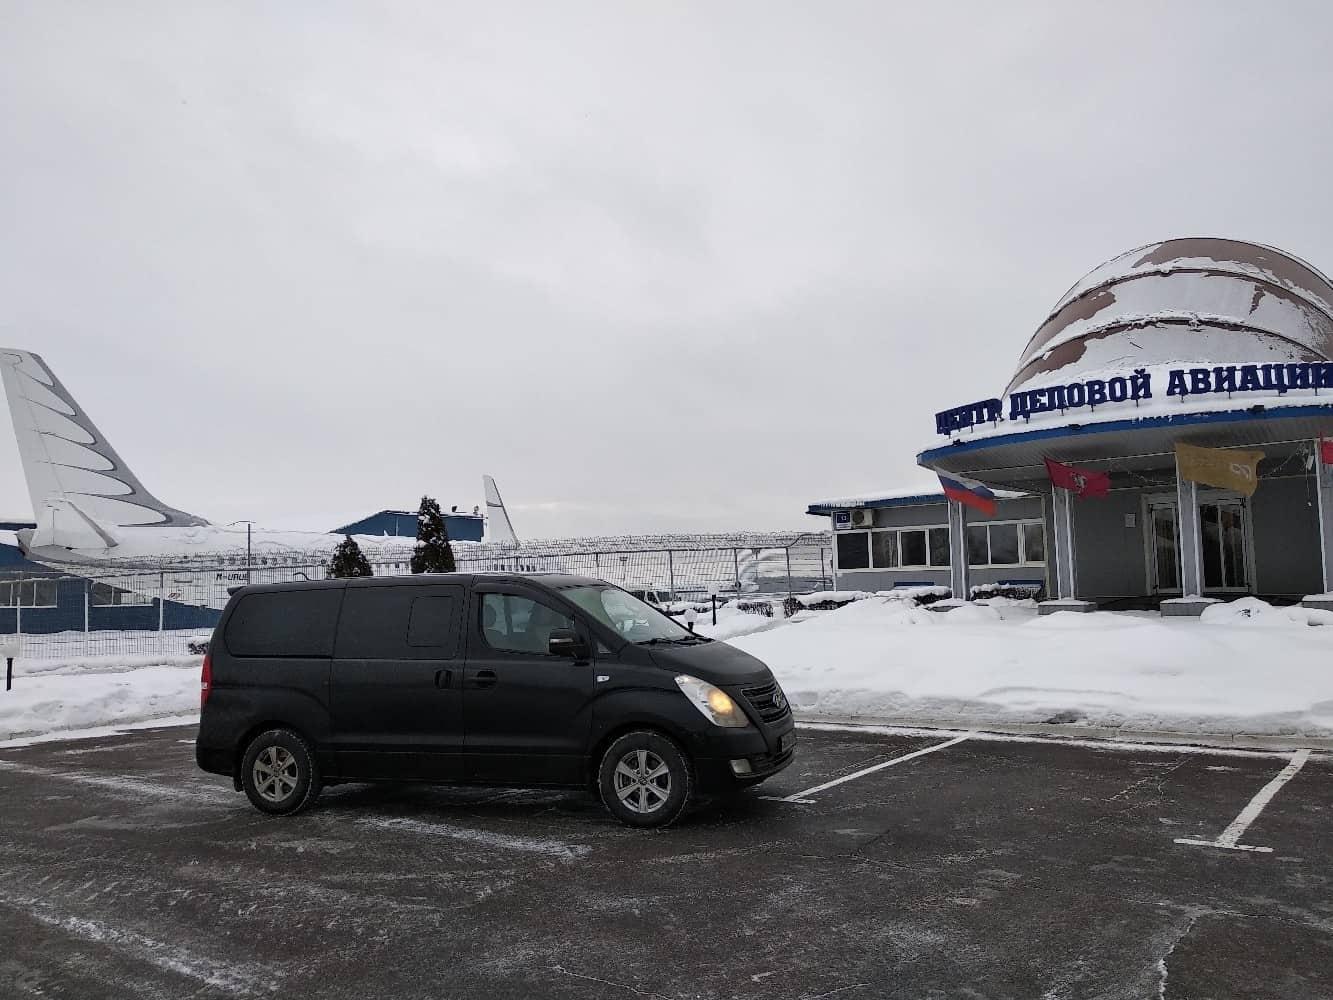 бизнес-такси в аэропорт Домодедово